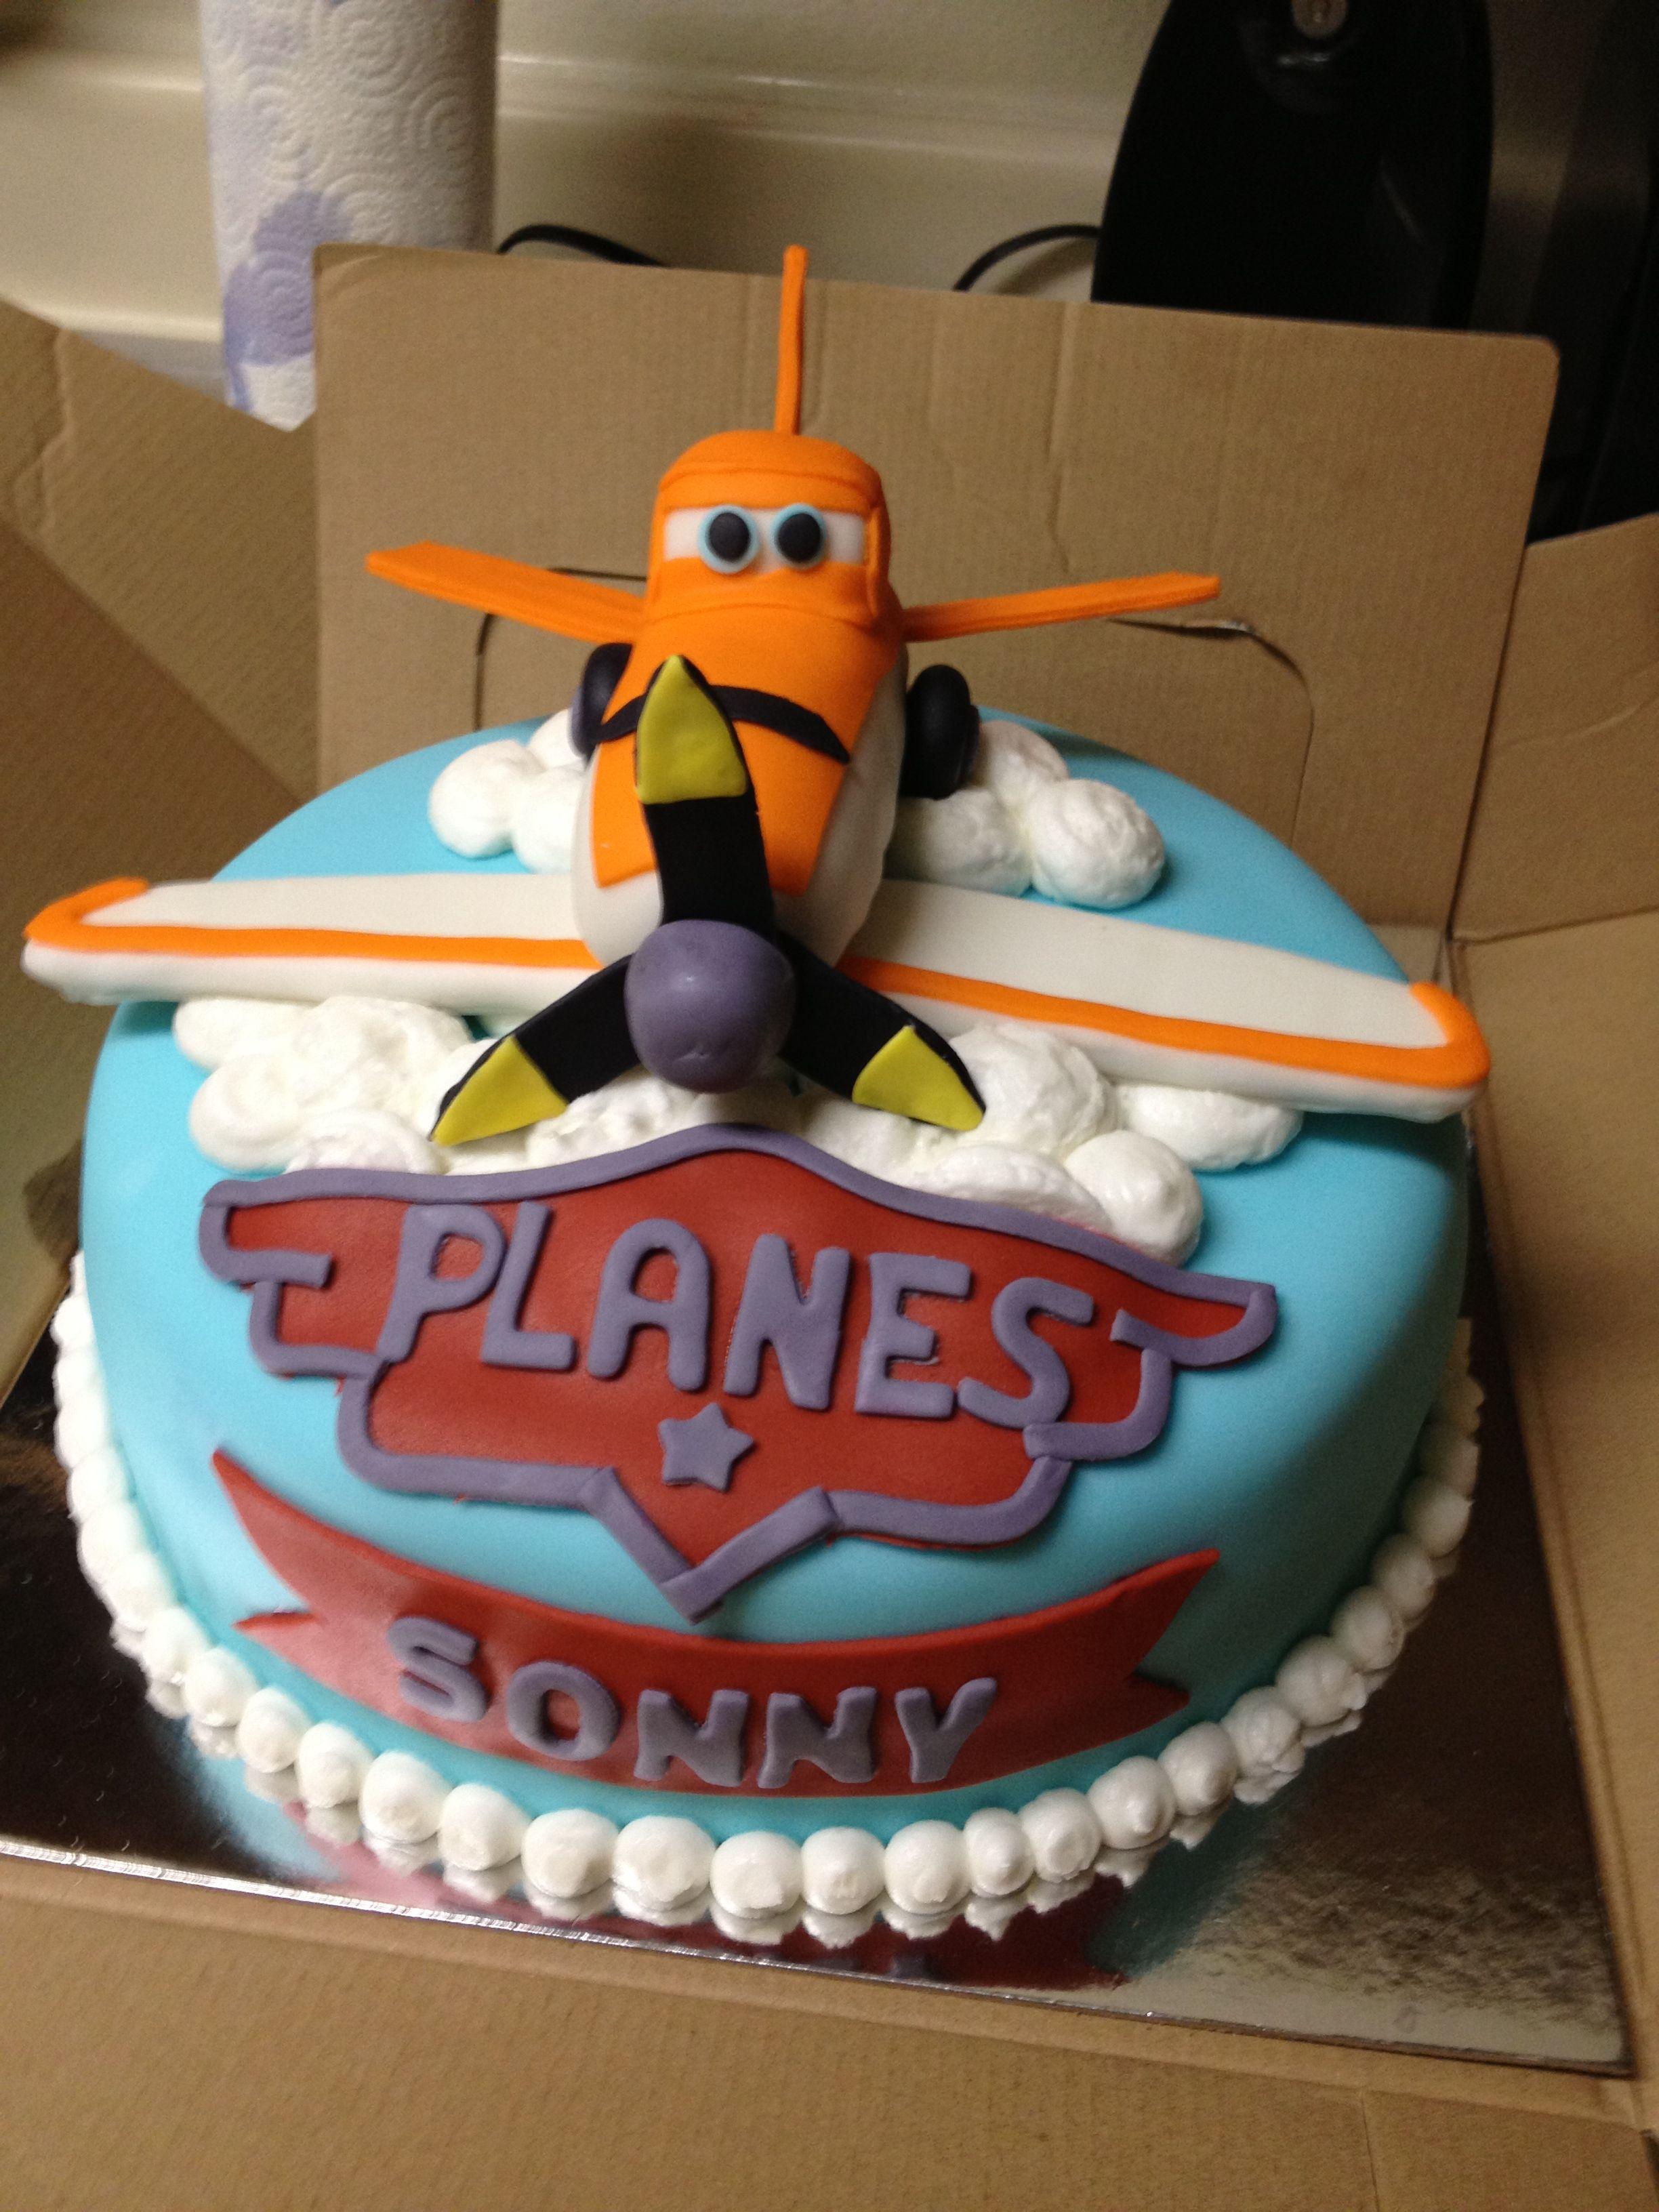 Planes Cake Birthday Cake Dusty Crophopper Cake Boy Cake Cakes